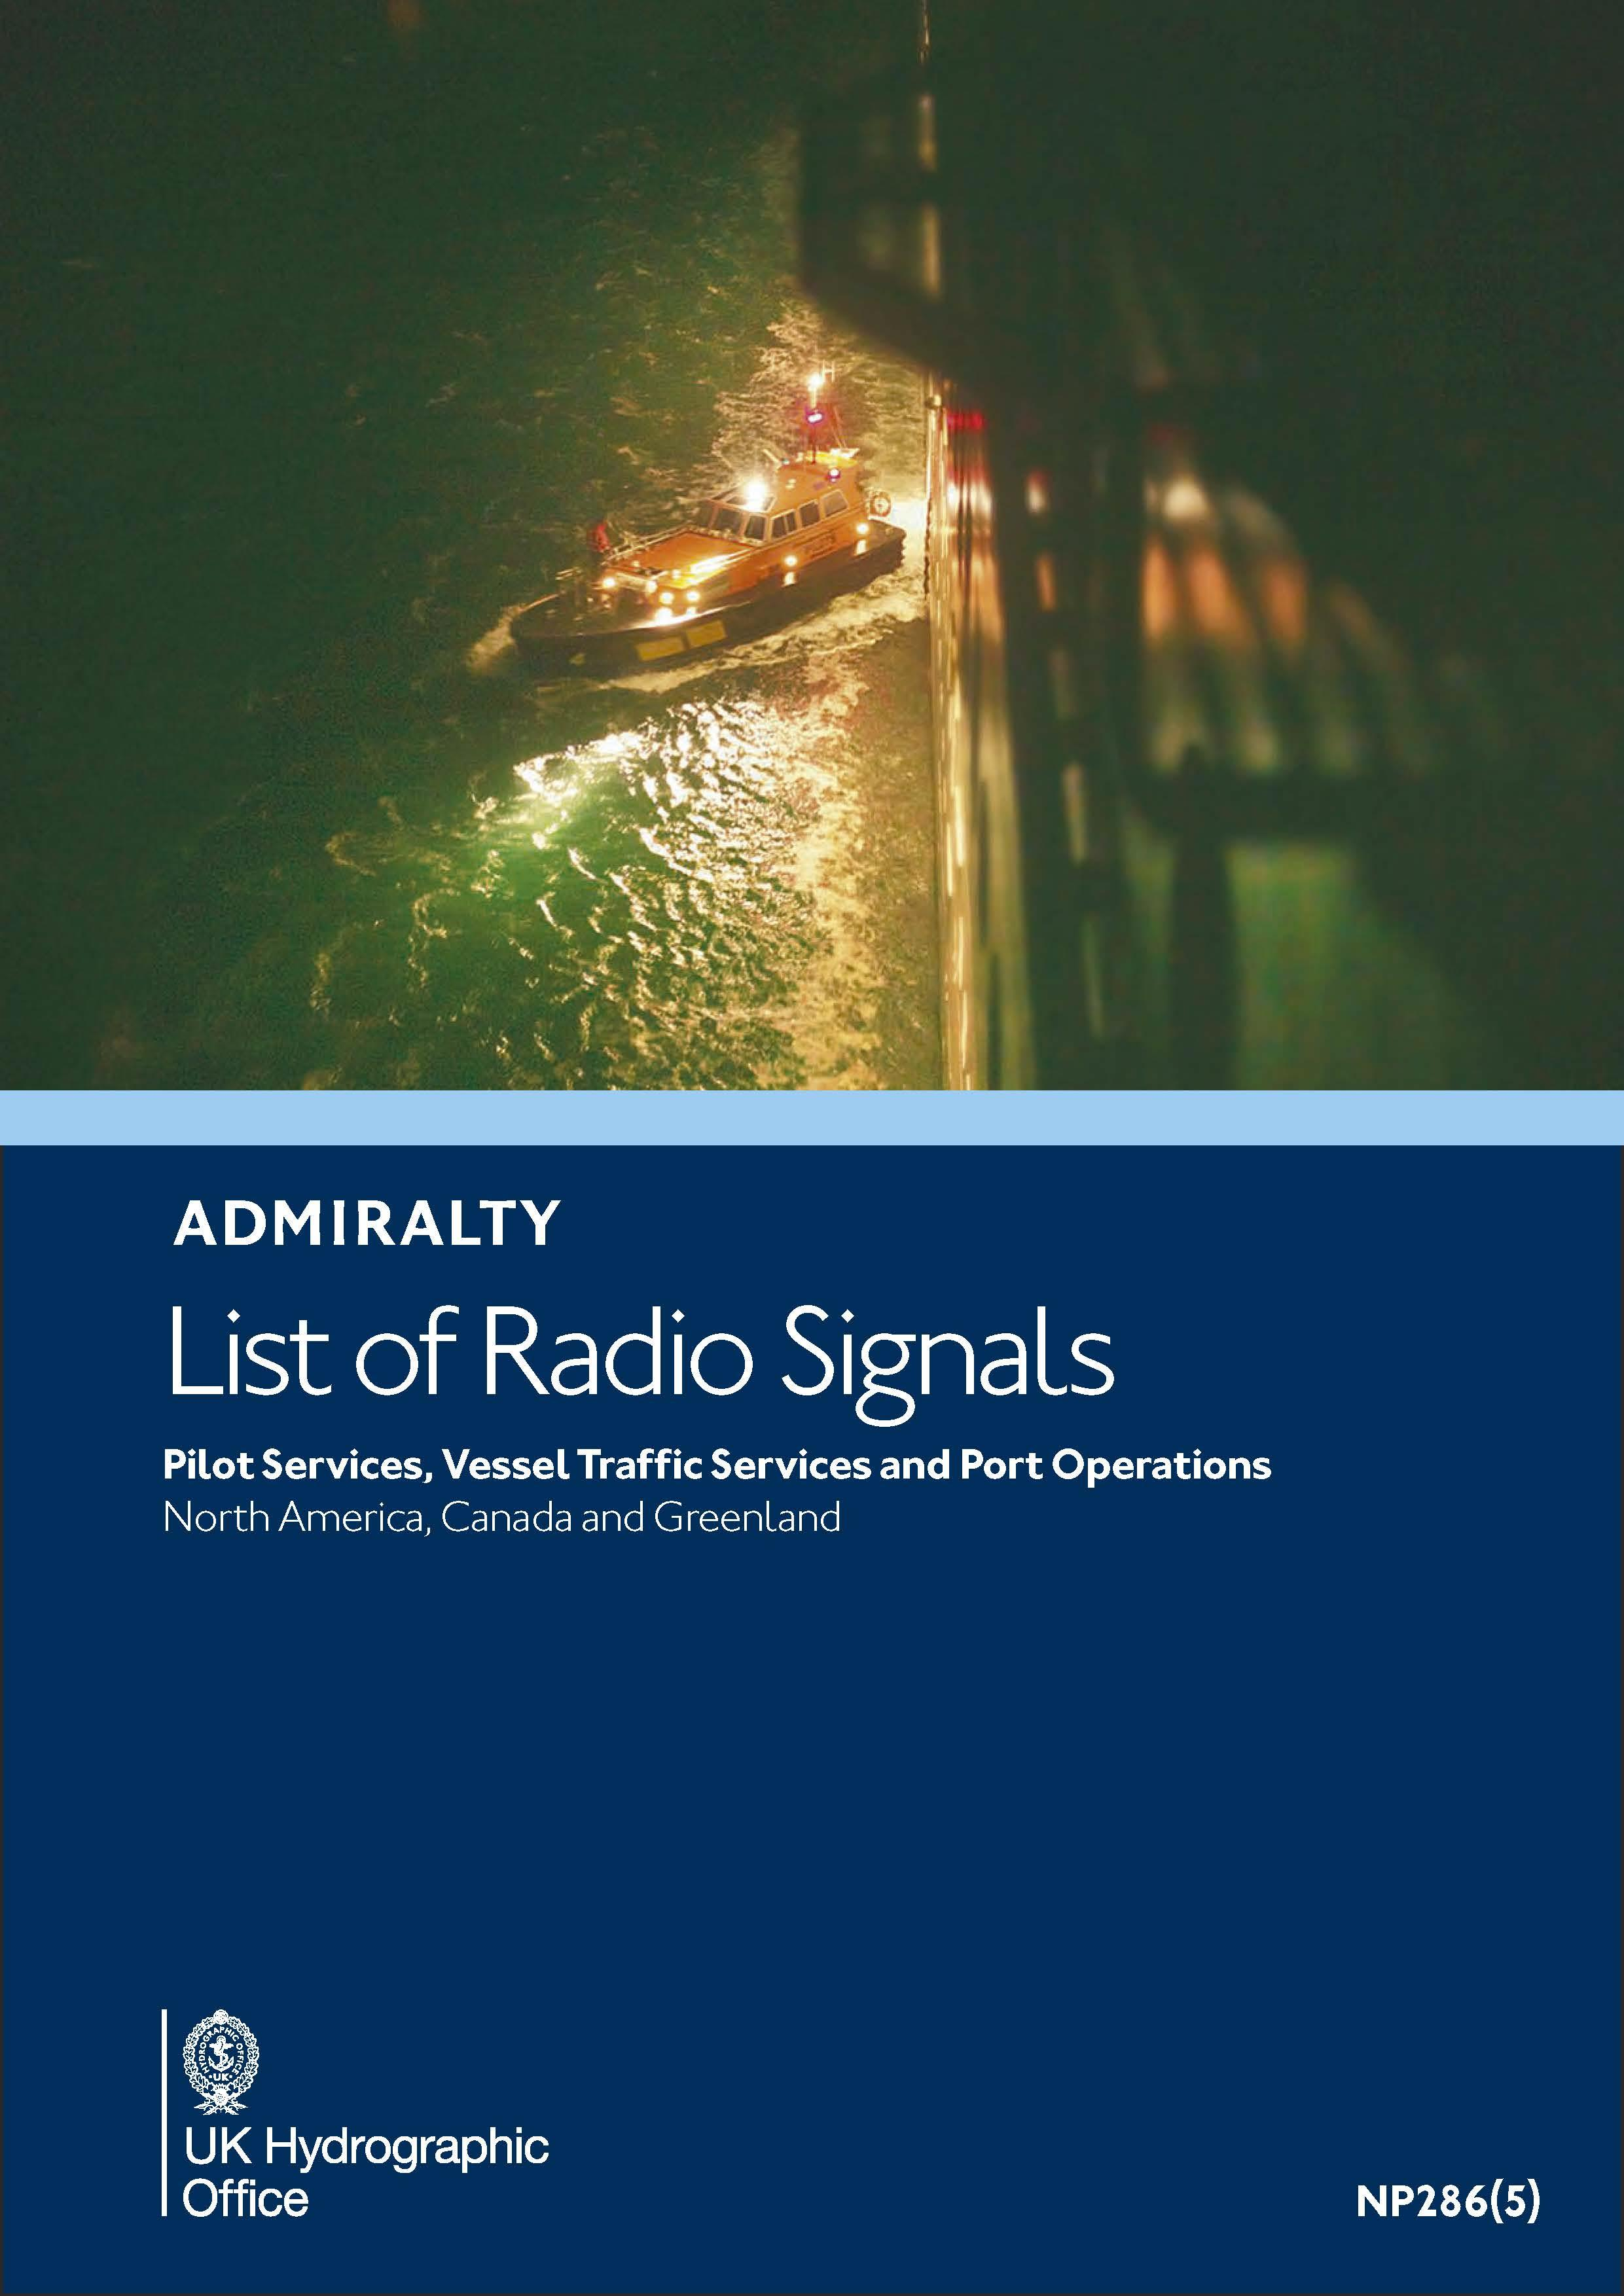 ADMIRALTY NP286(5) RadioSignals Pilot, VTS & Port Ops - North-America (USA, Canada, Greenland)